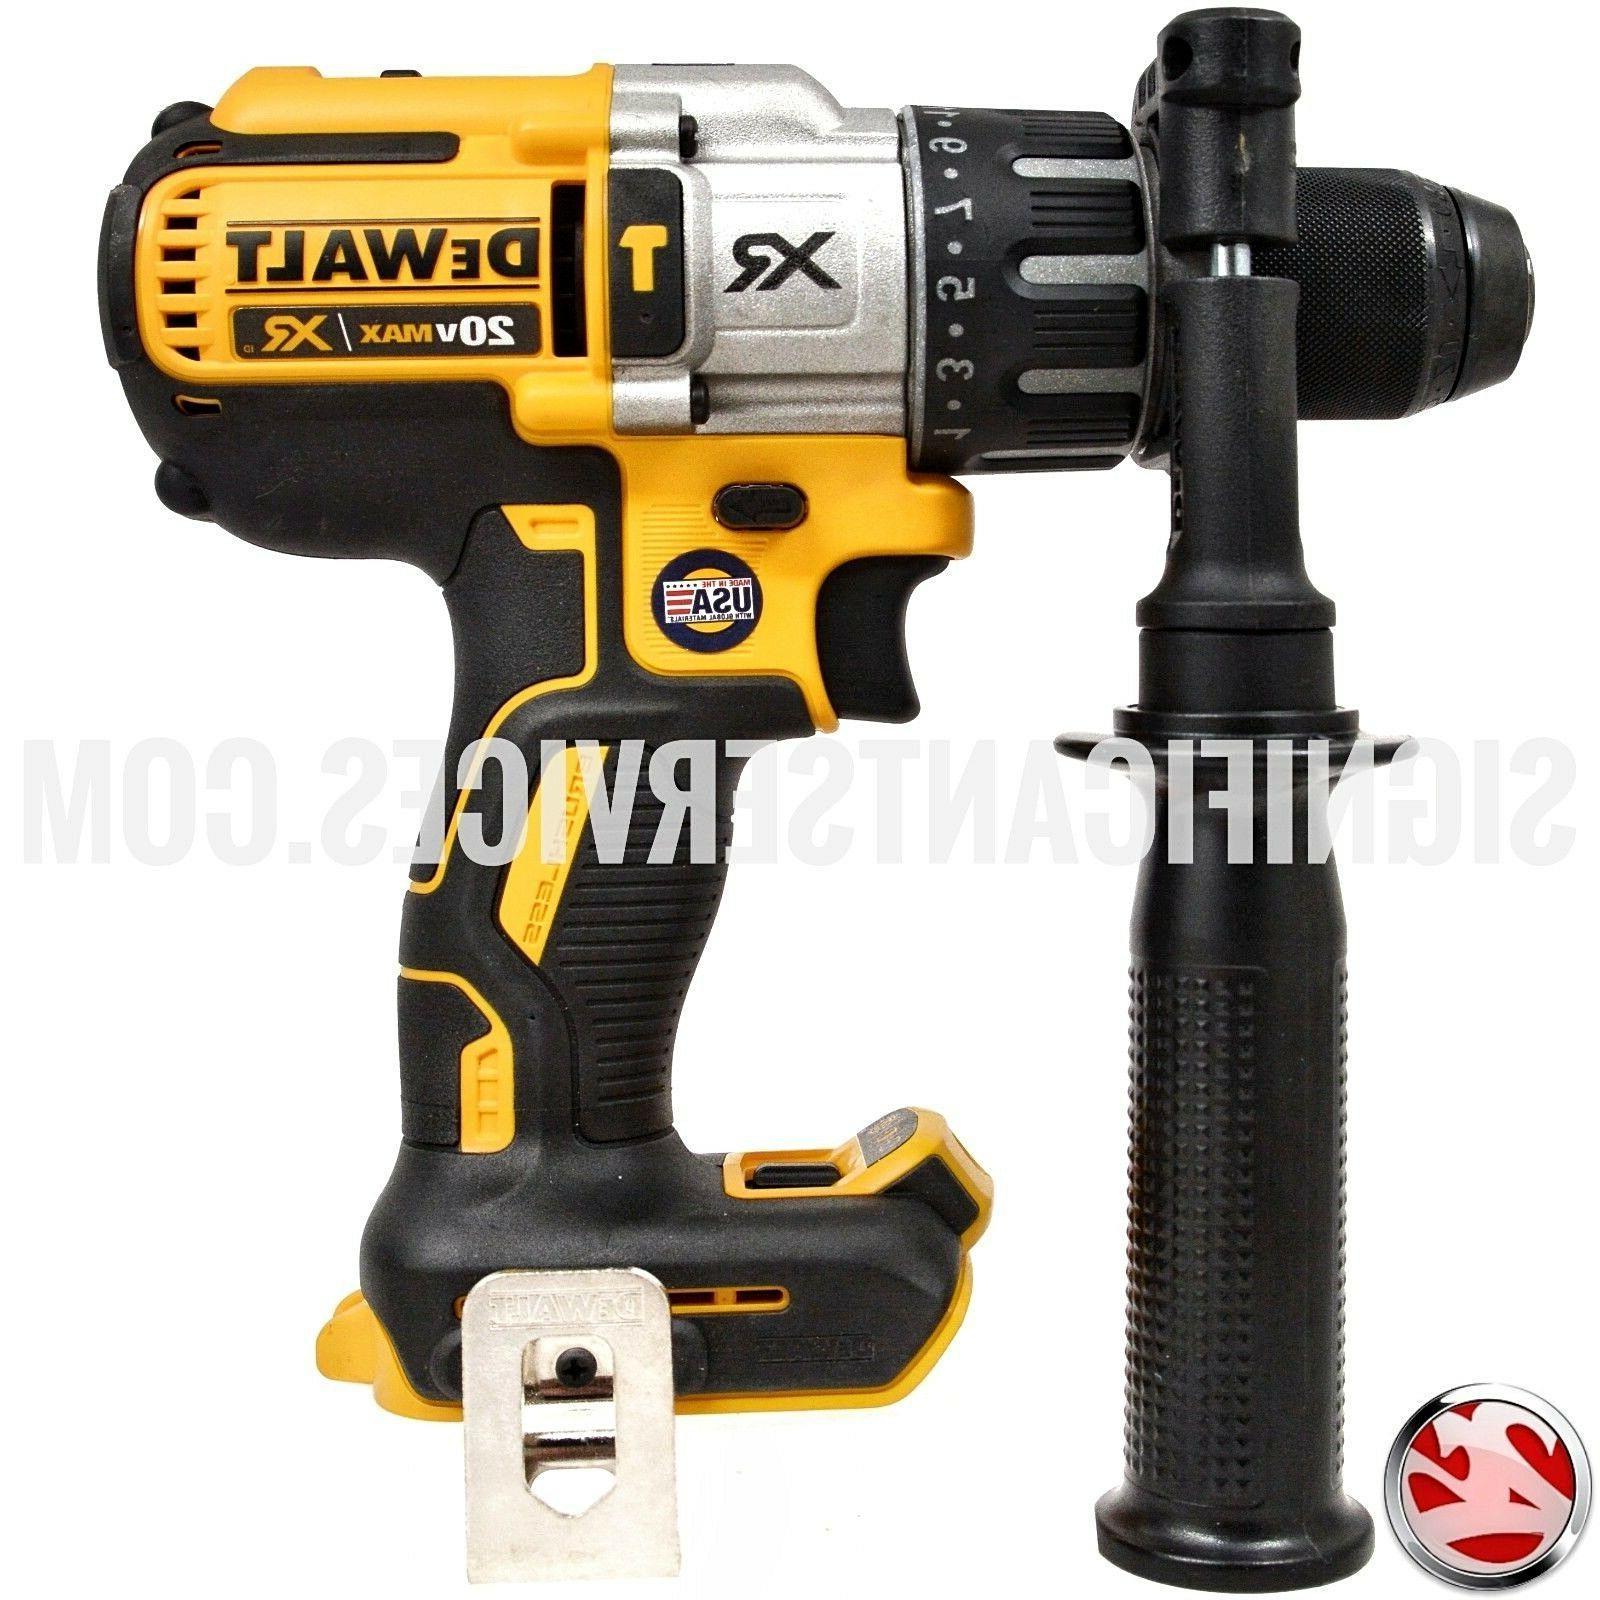 DEWALT 20V MAX Ion Brushless Hammer Drill